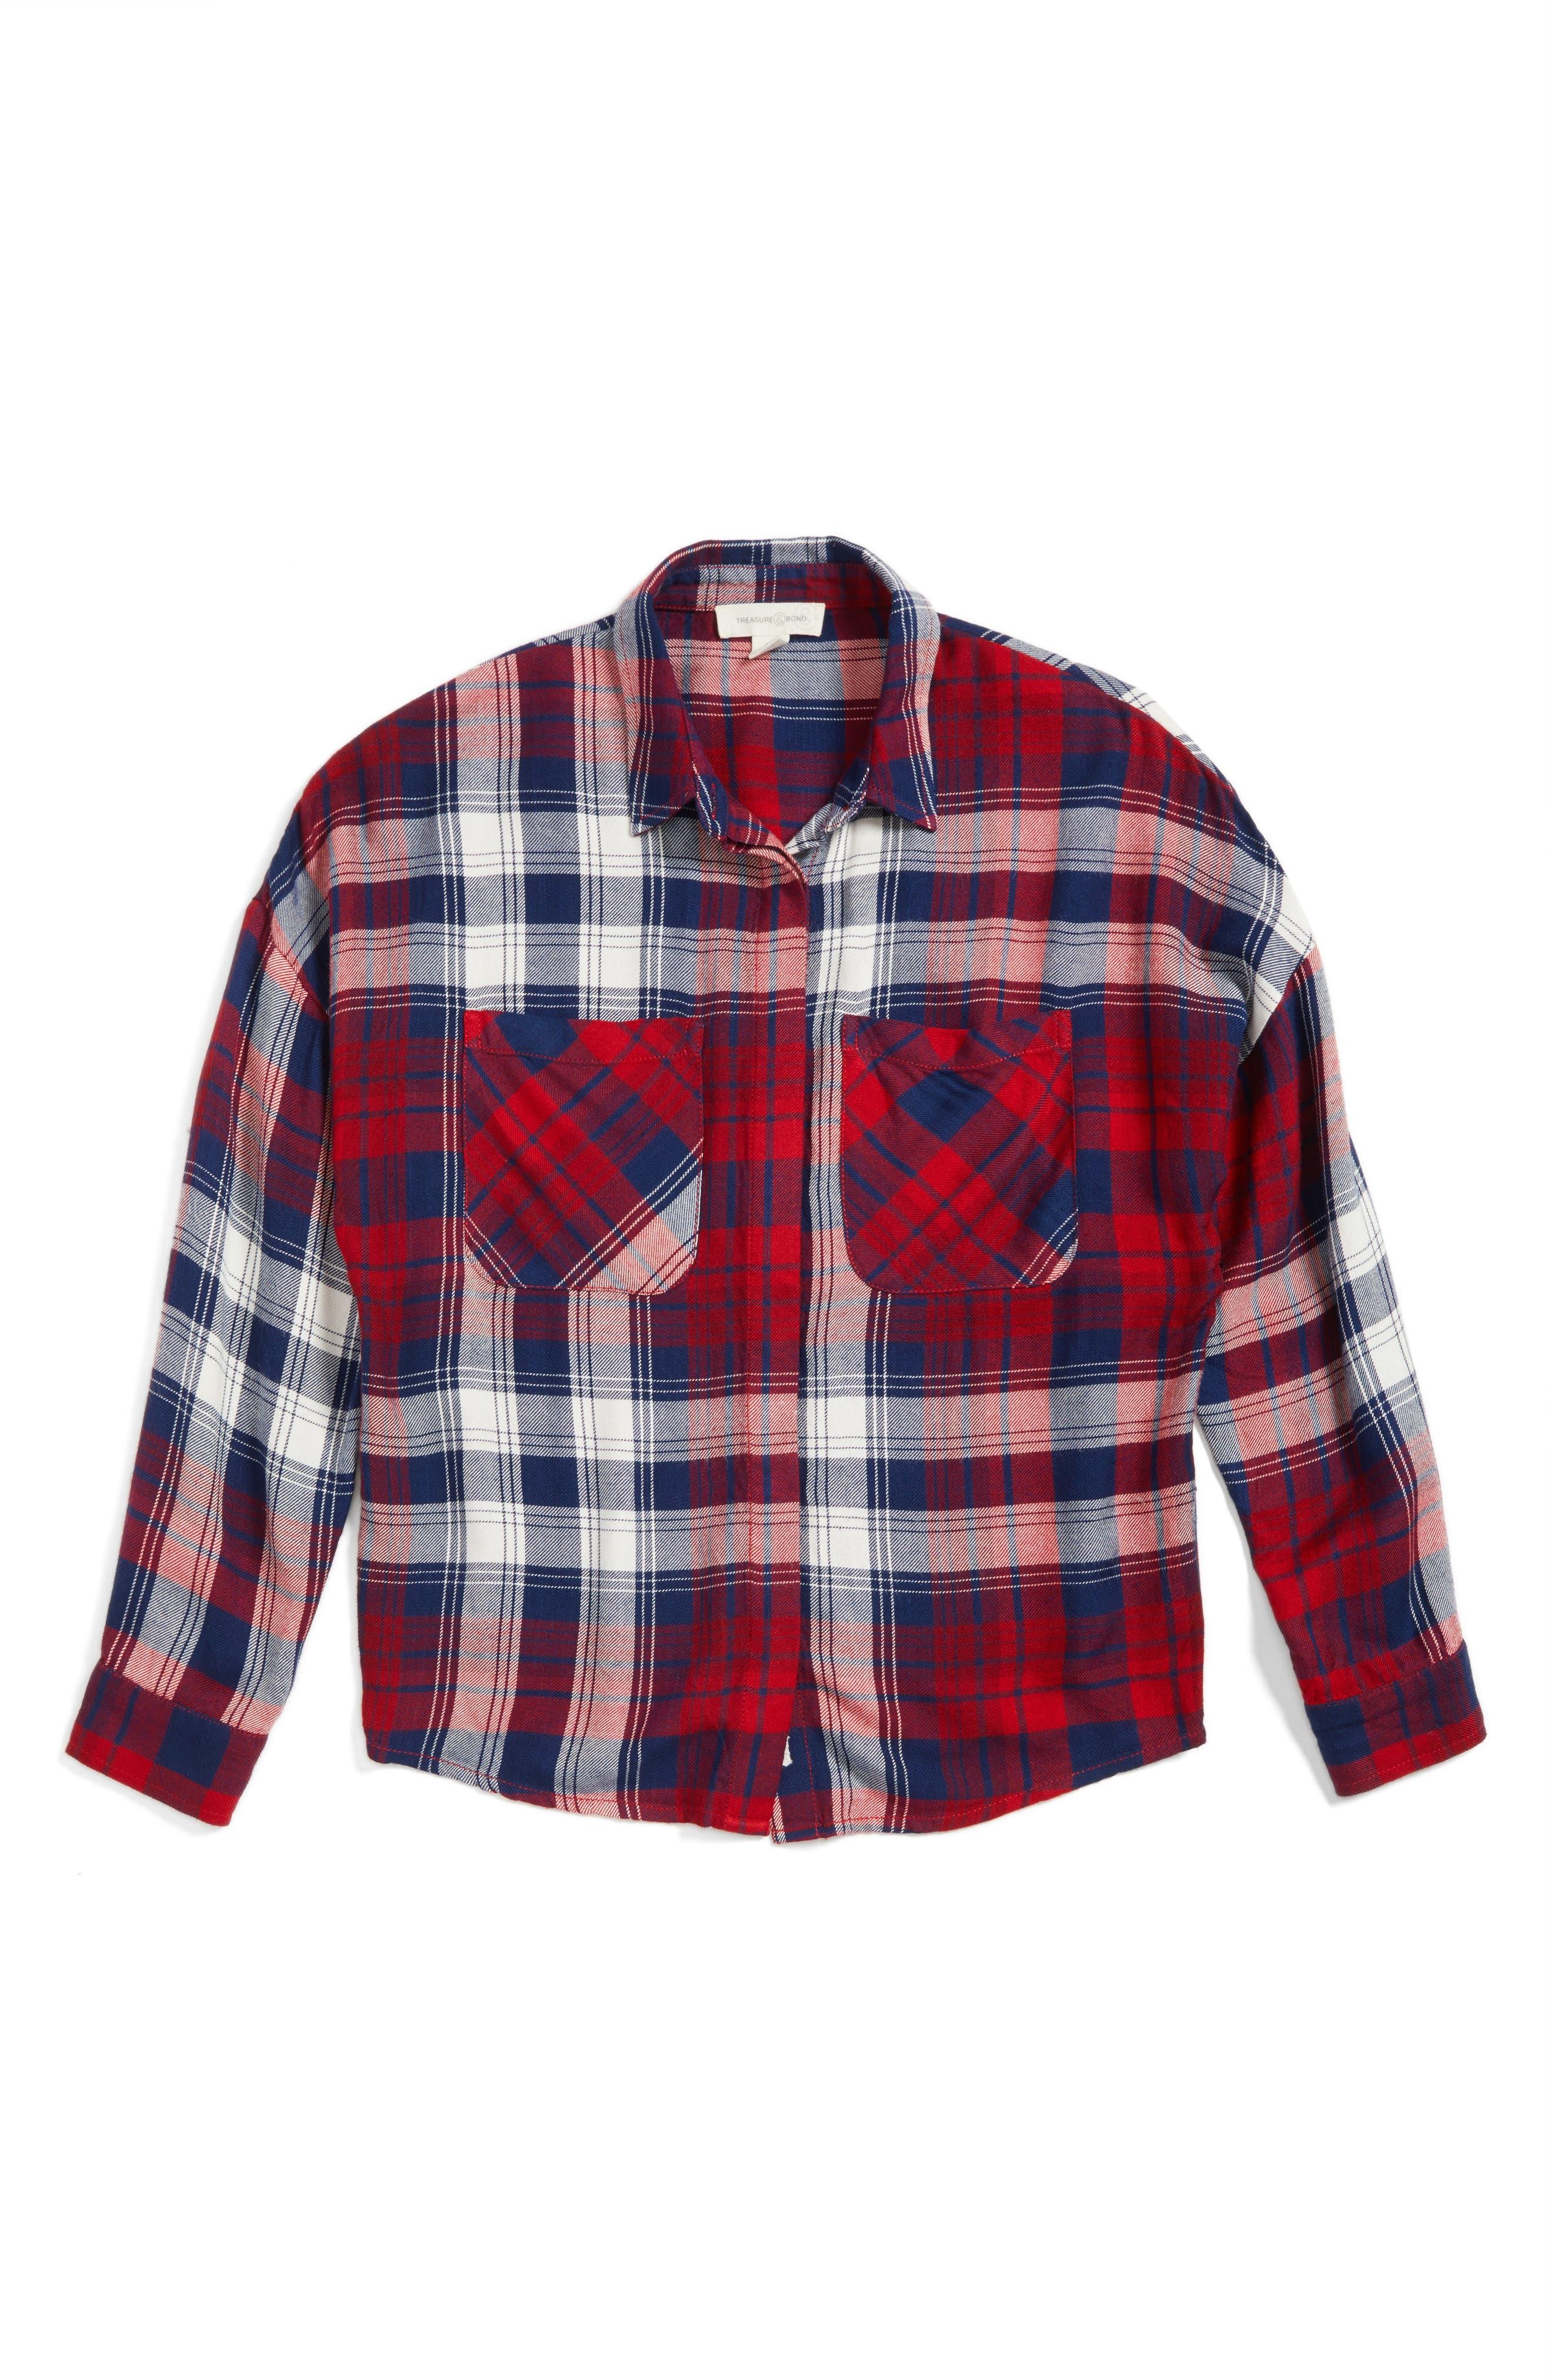 TREASURE & BOND Oversize Pocket Plaid Shirt